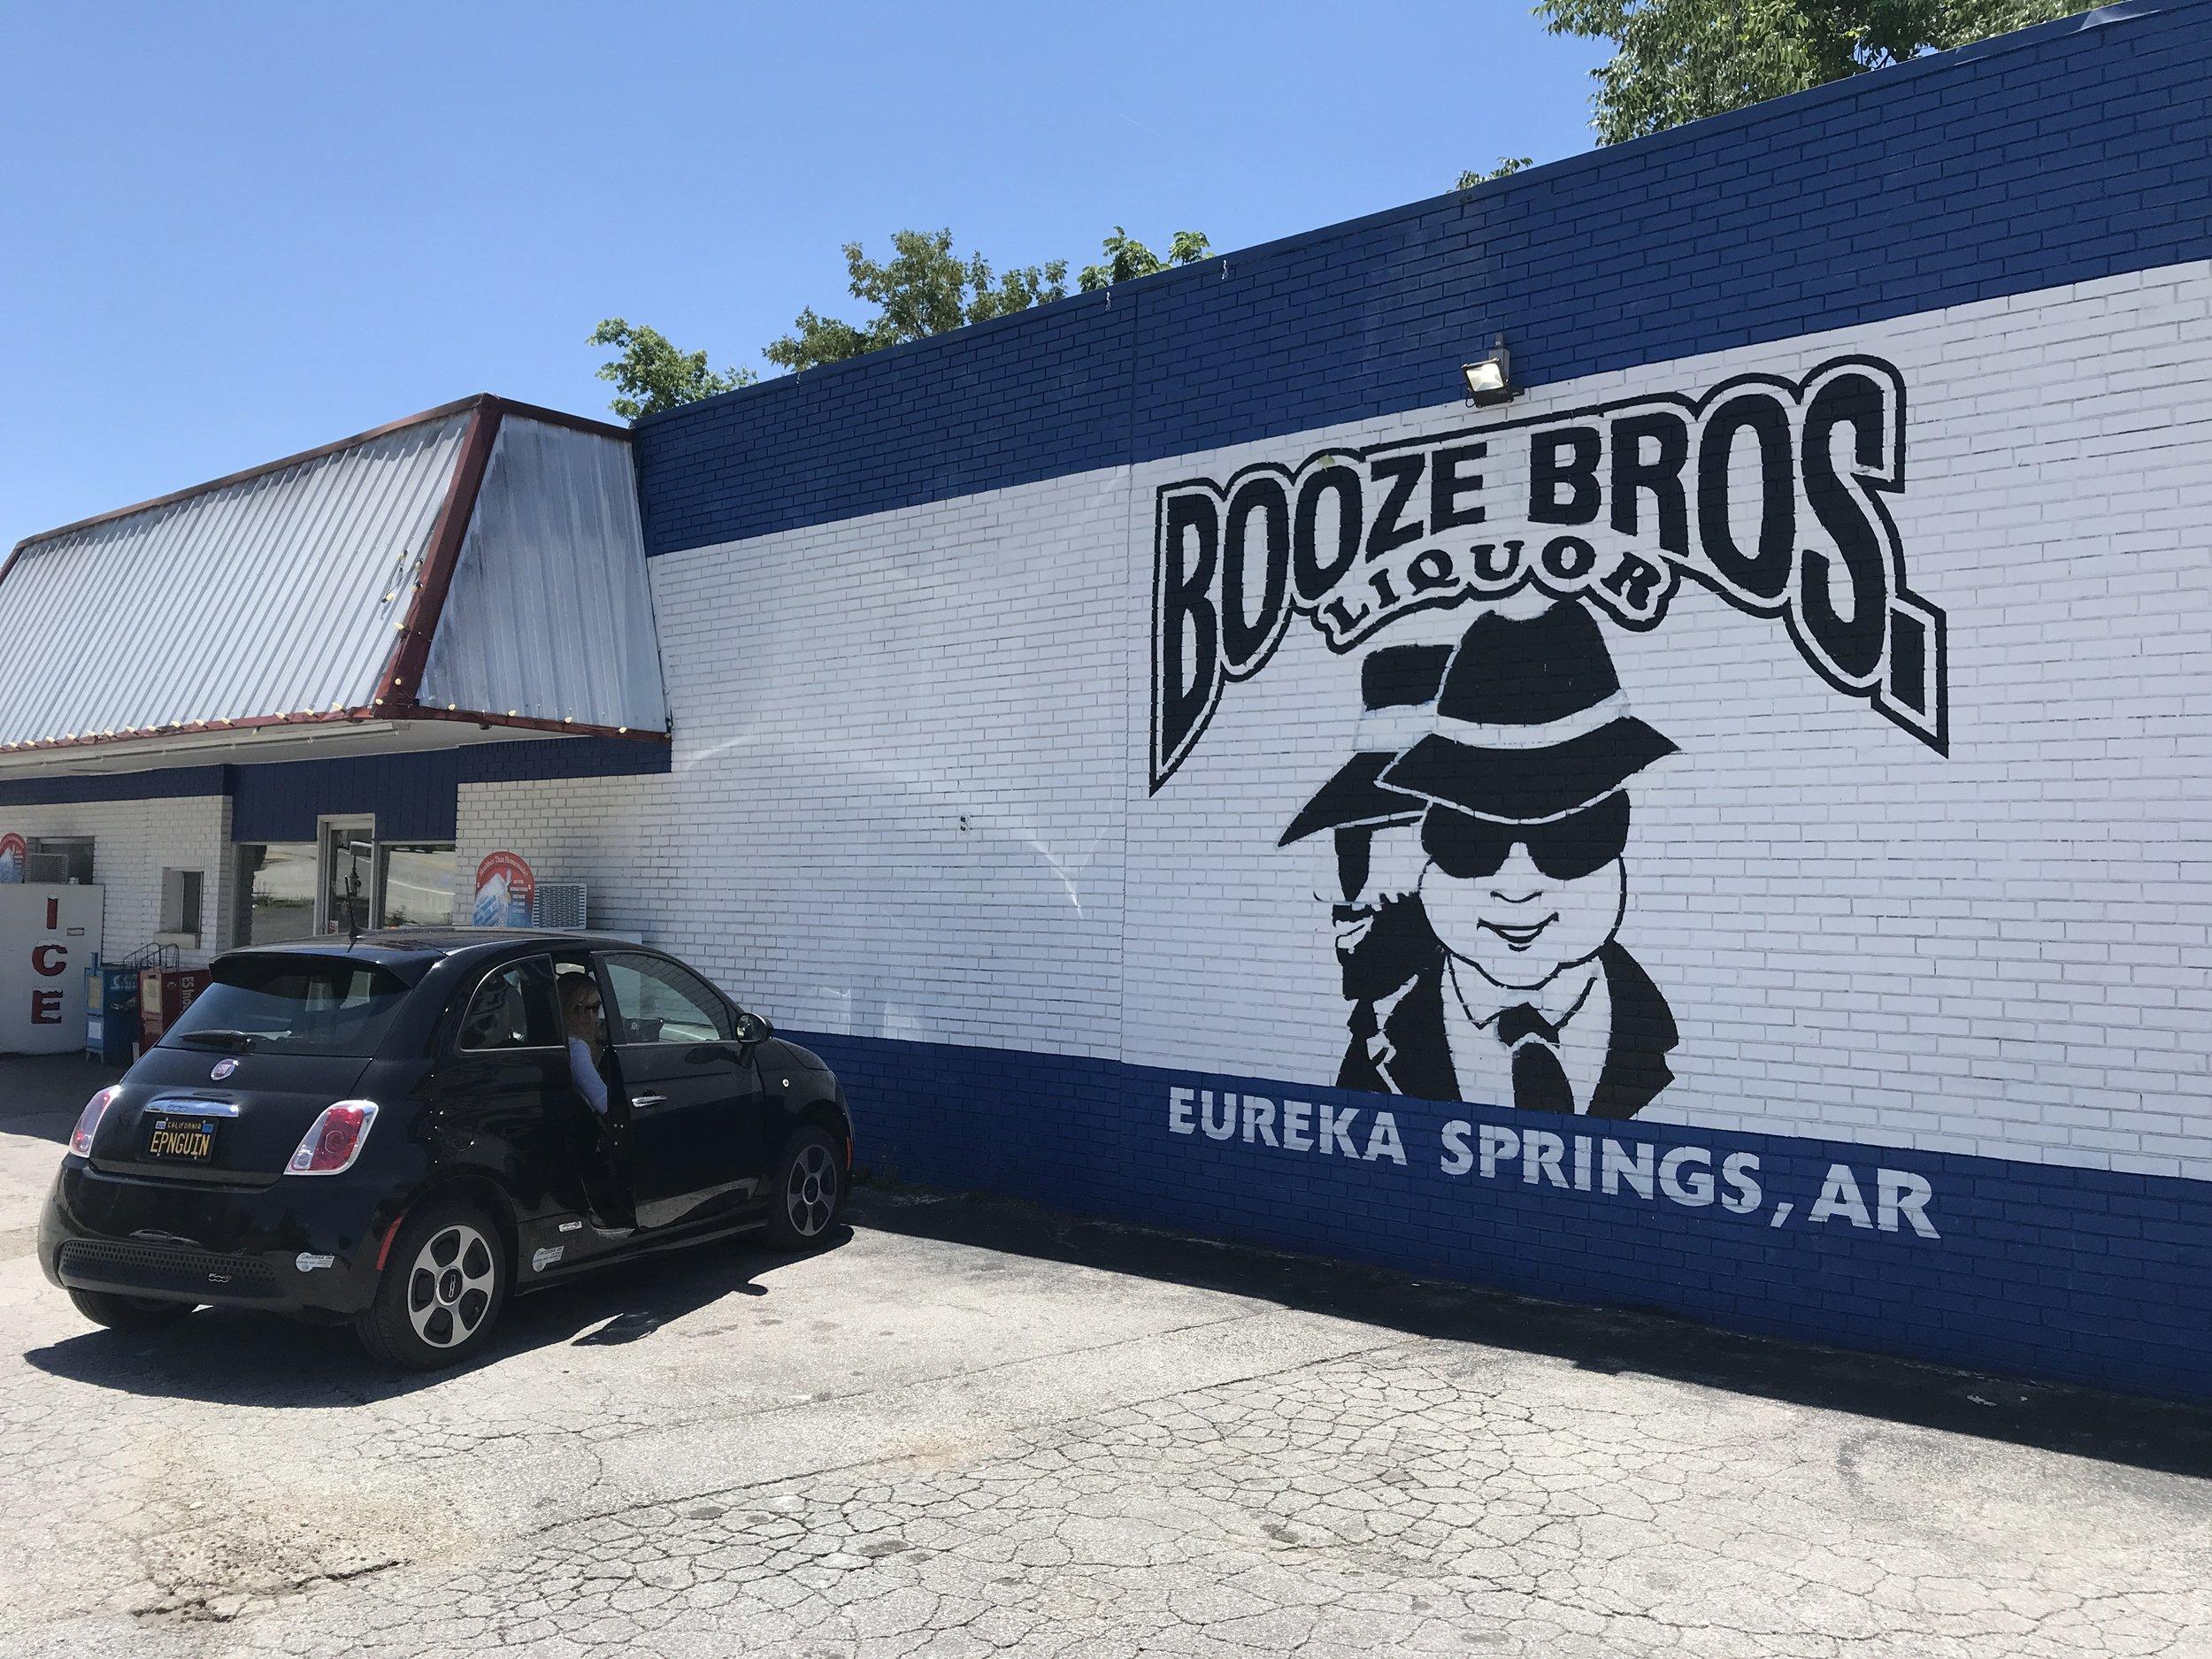 Booze Brothers liquor store